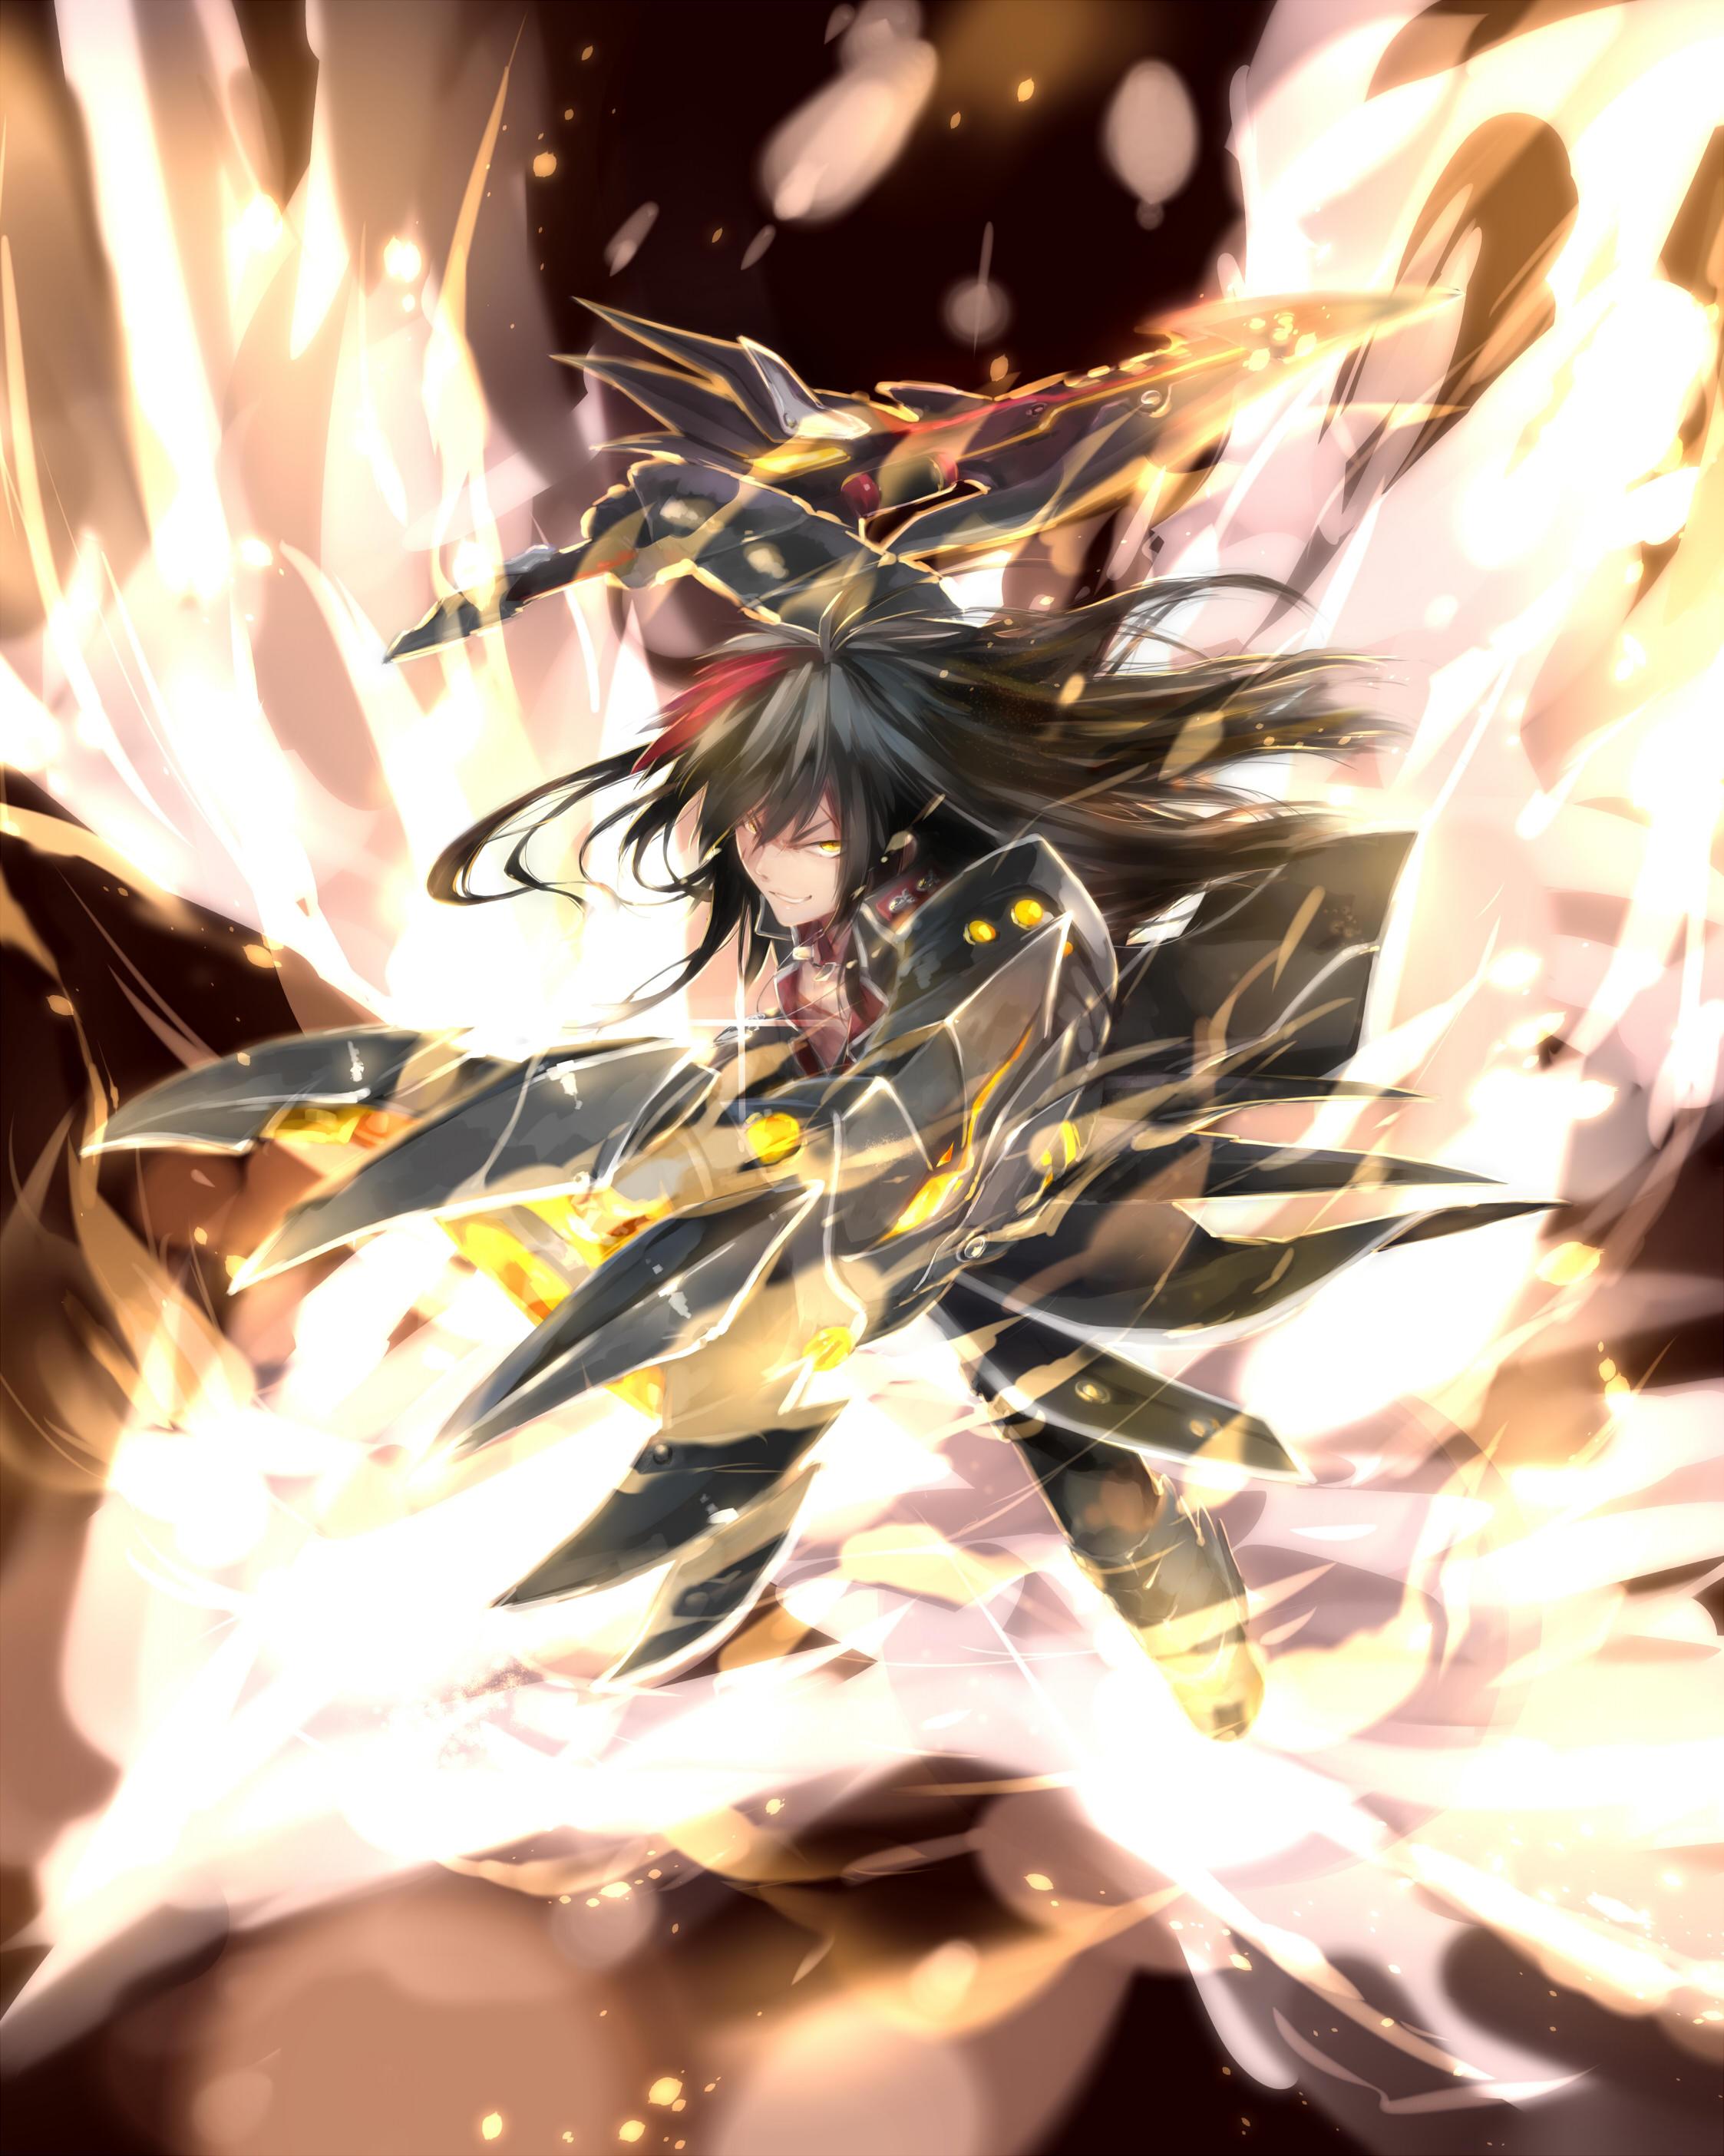 Weapon Taker Raven Download Image